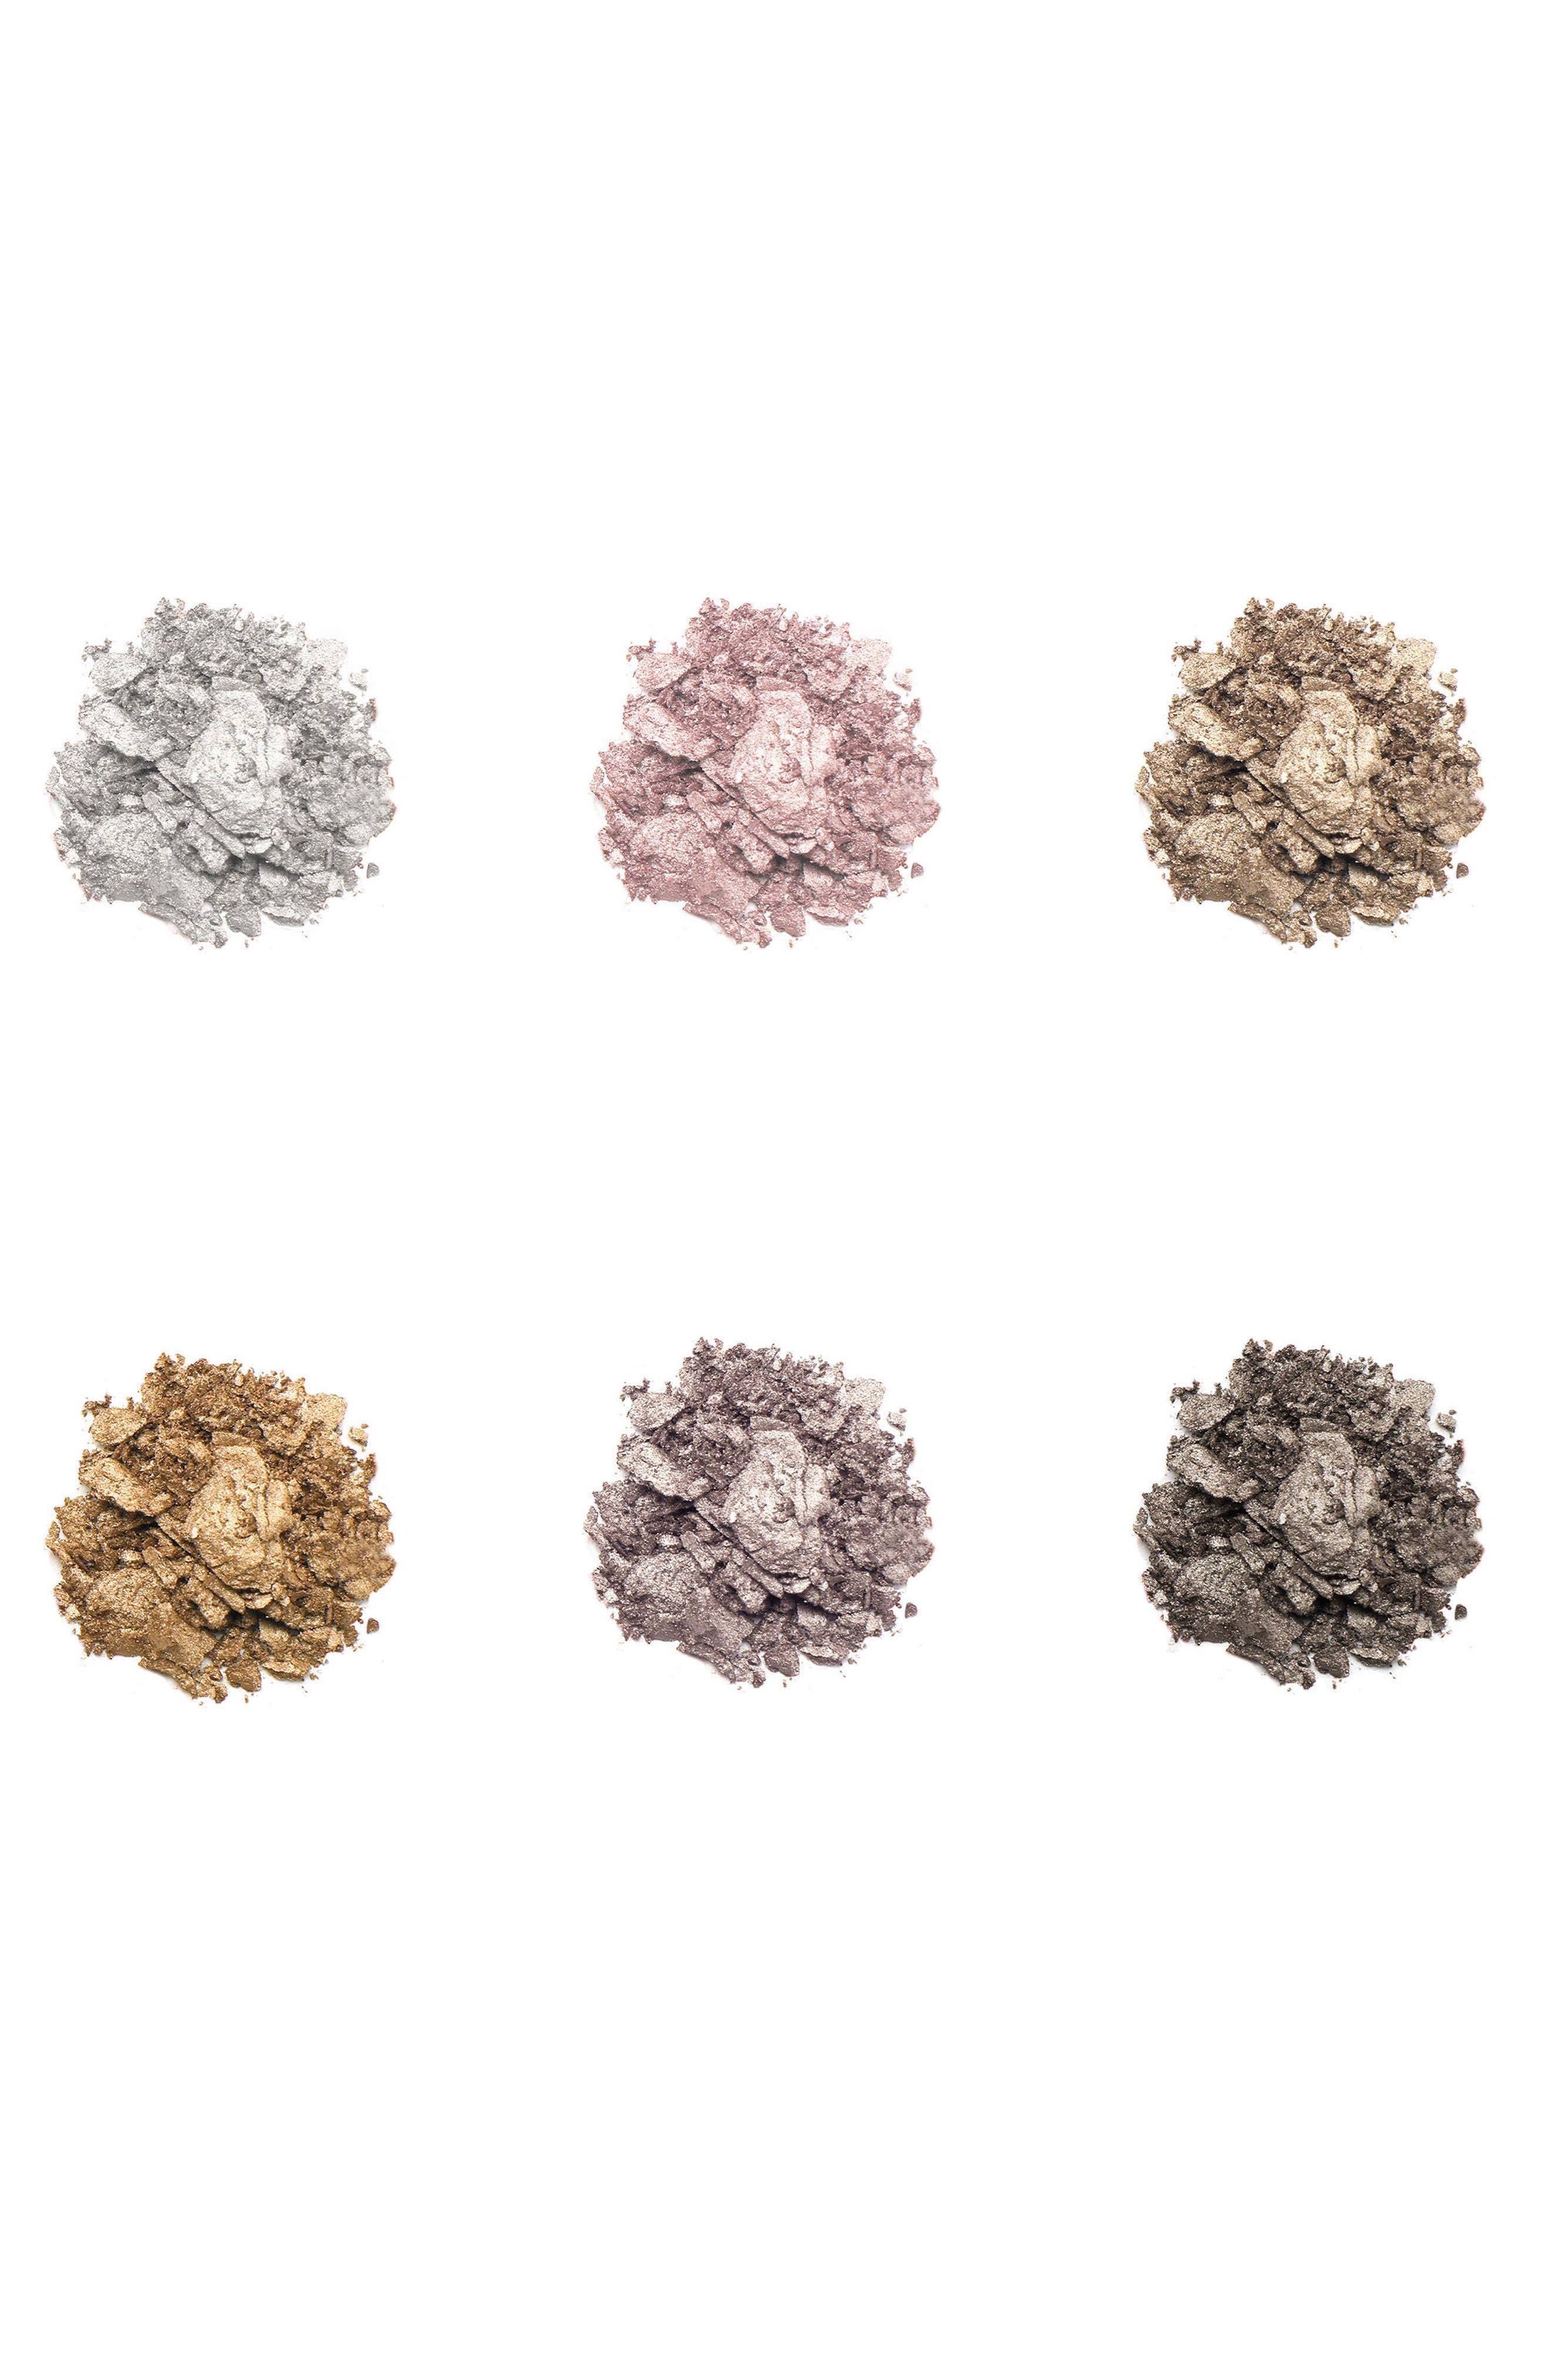 Alternate Image 2  - Jouer Skinny Dip Ultra Foil Shimmer Shadows Palette